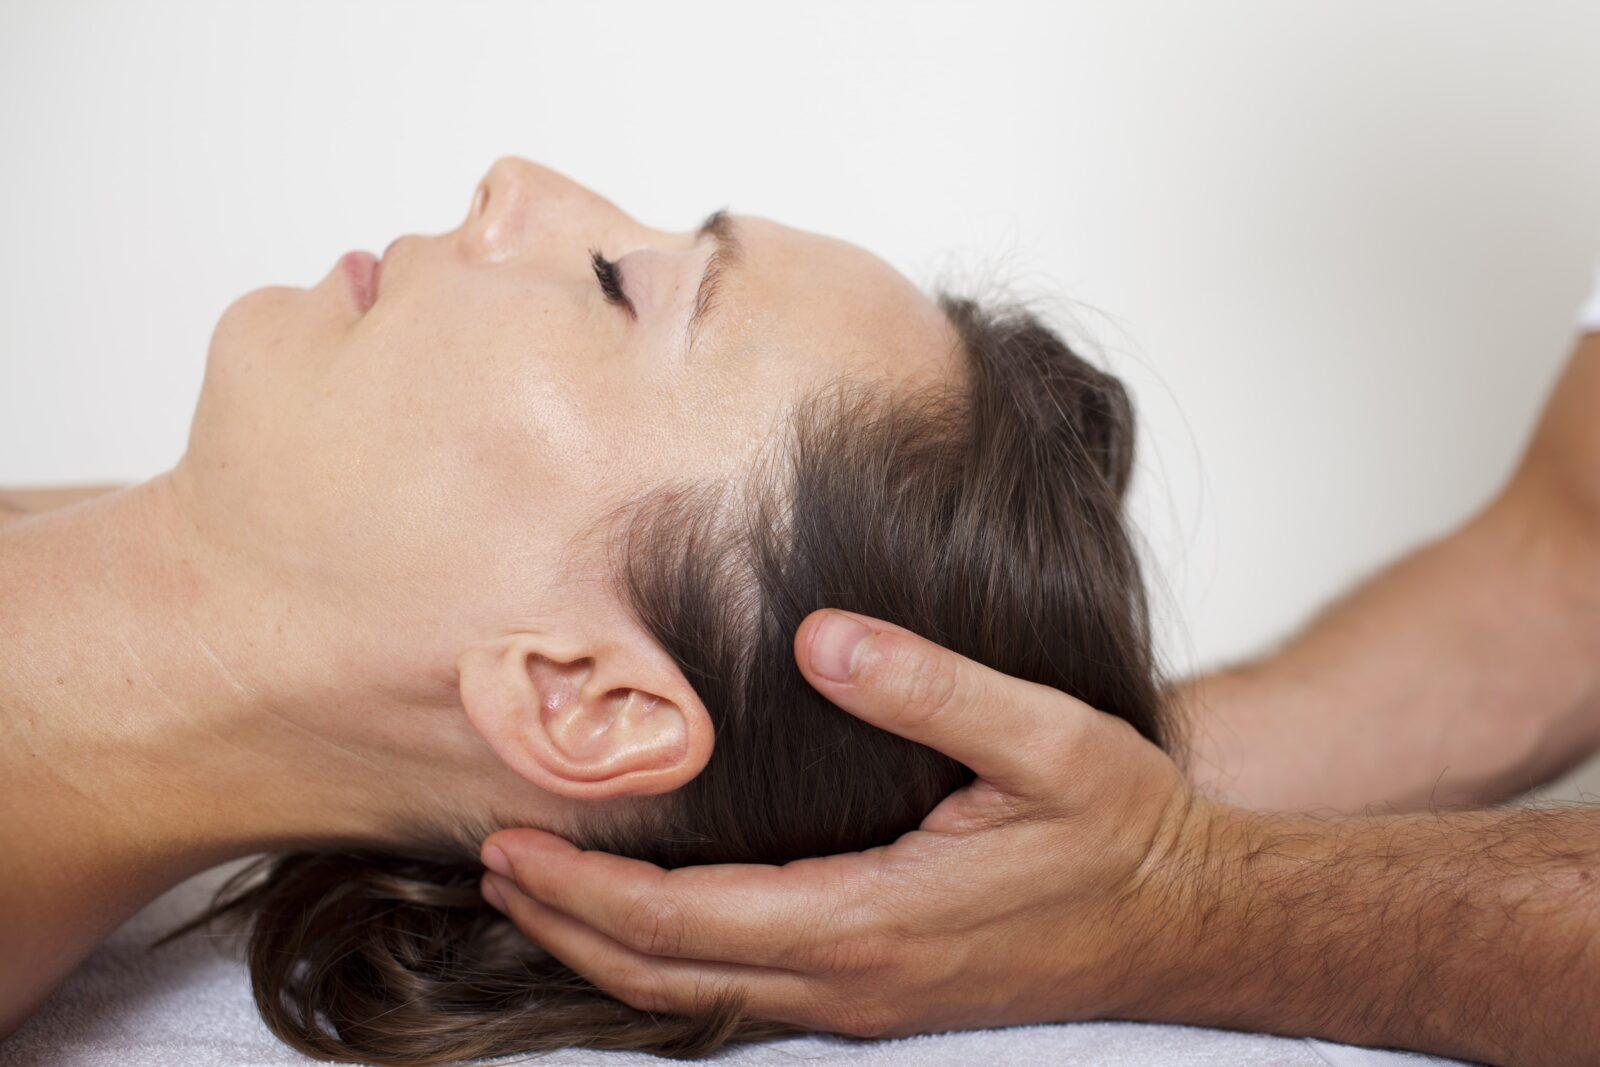 osteopathic cranial manipulation